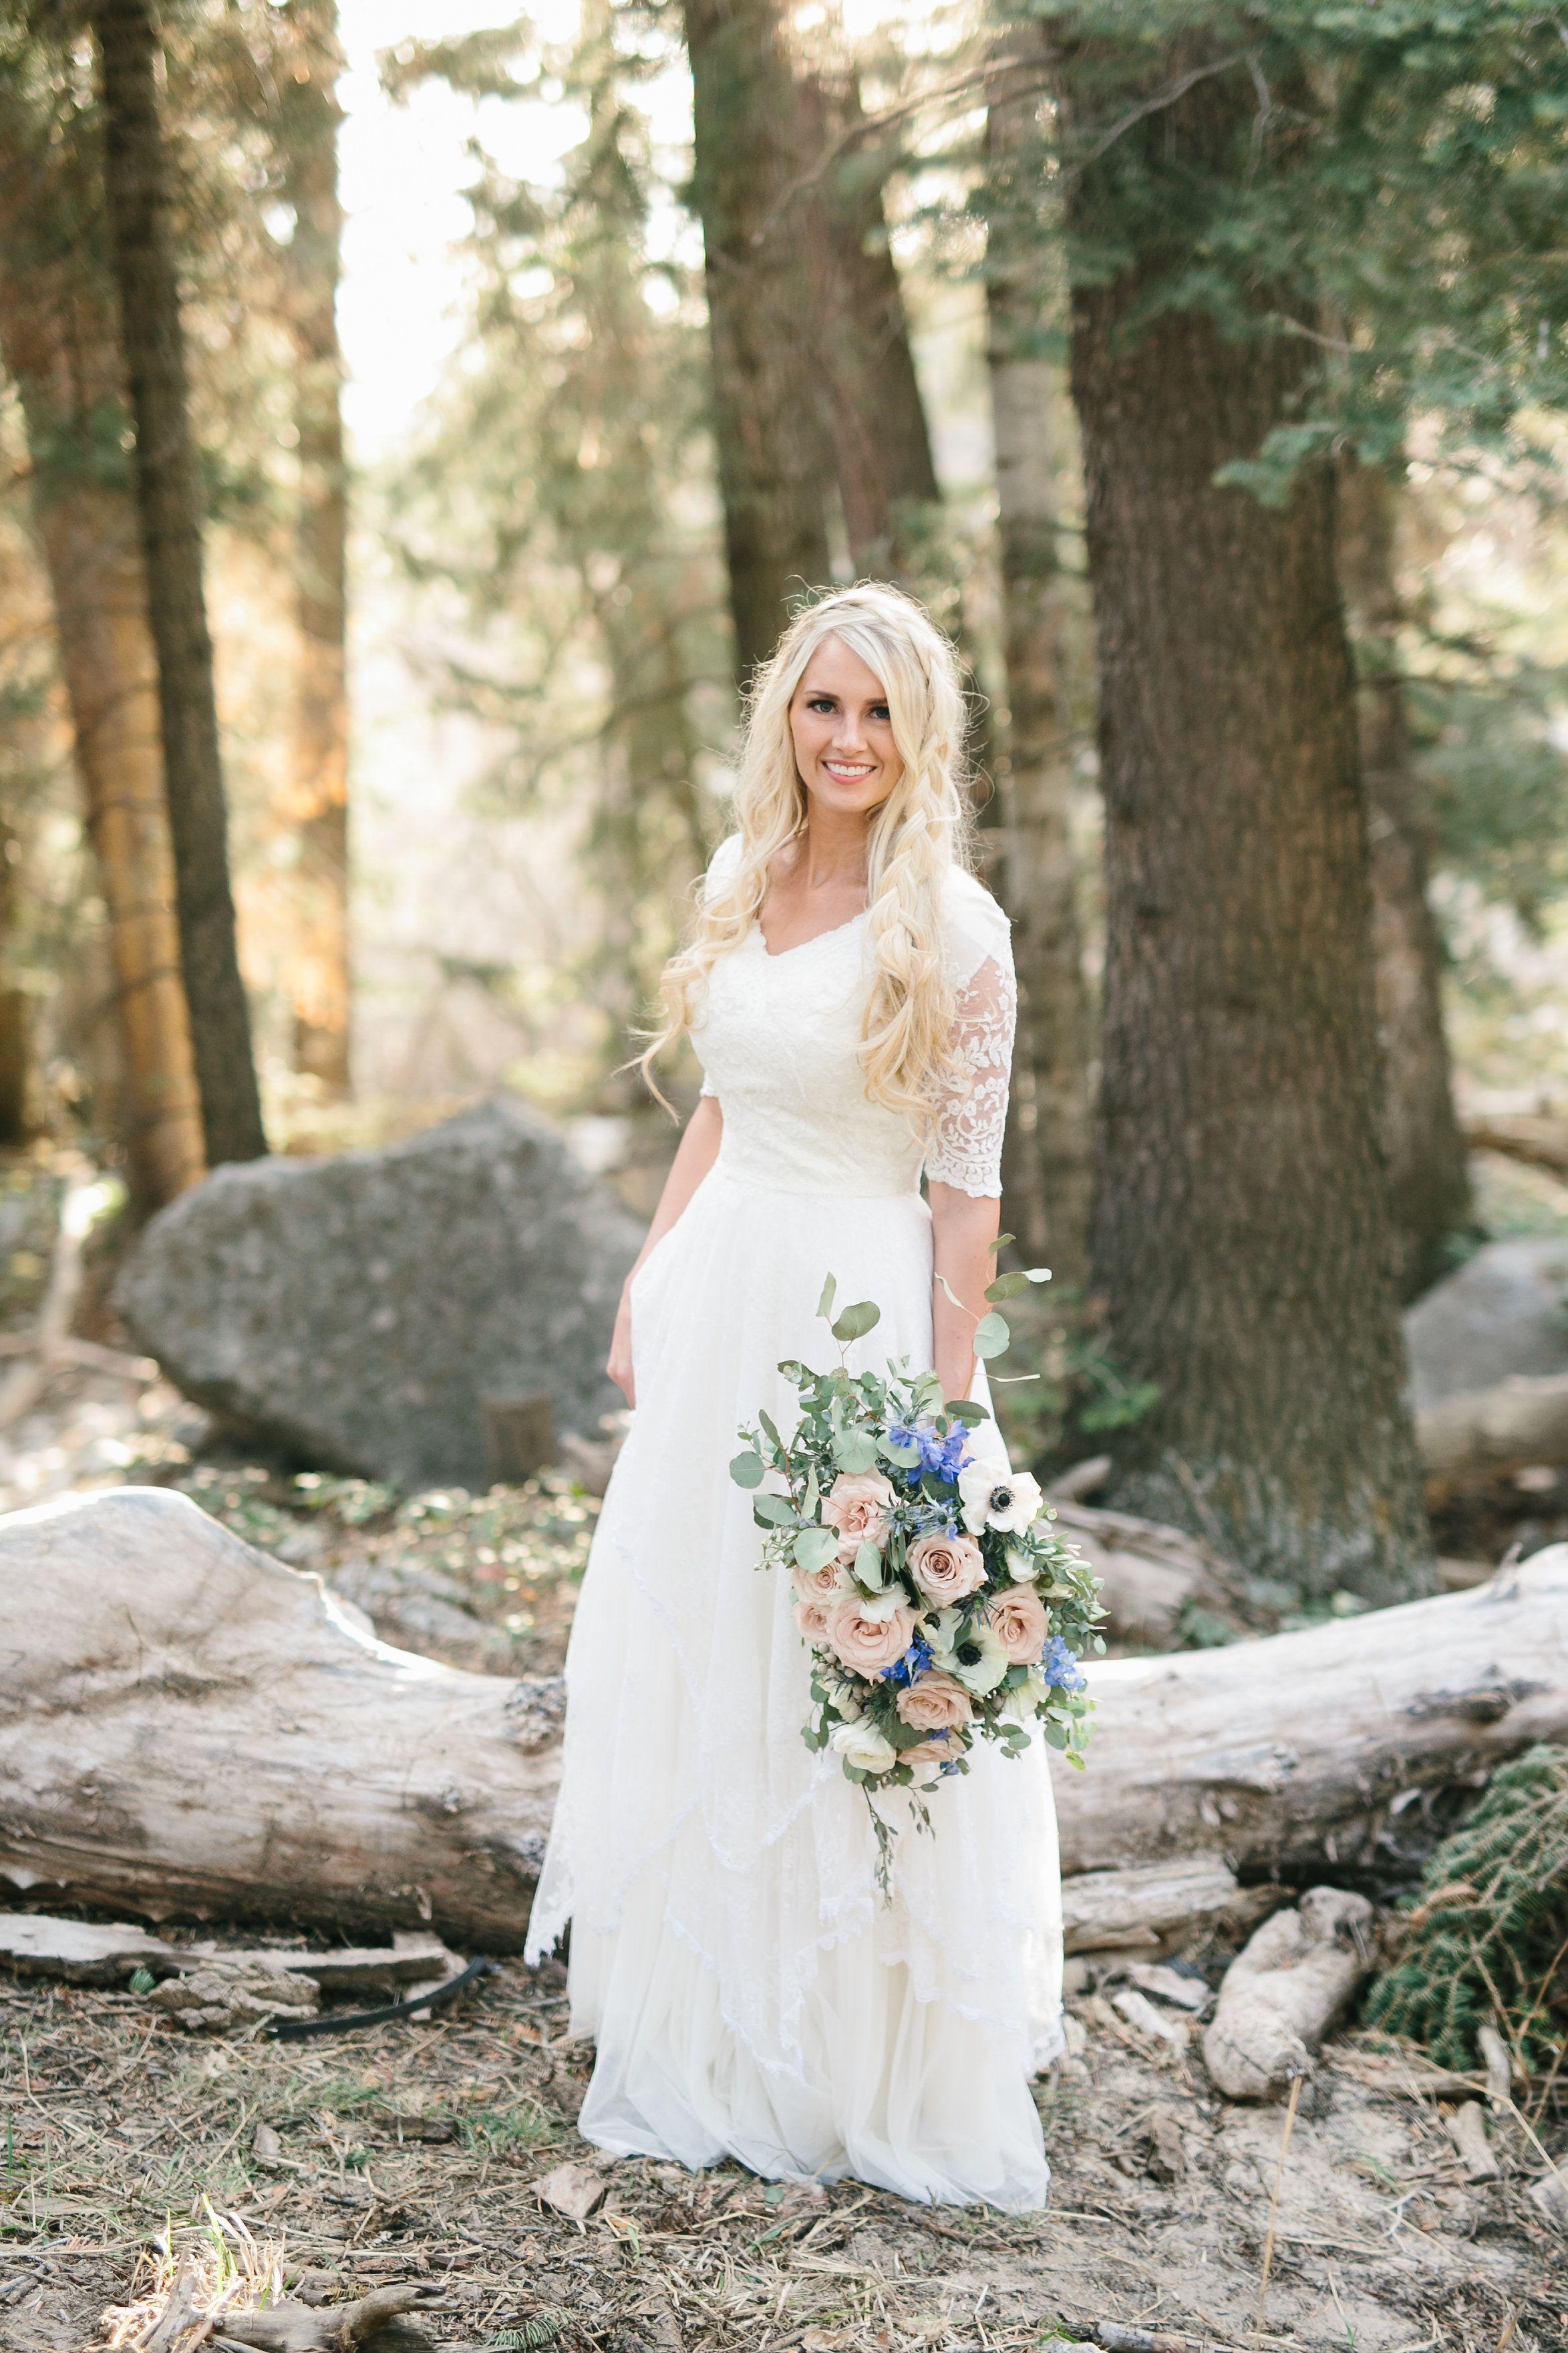 Modest Wedding Dress Rental Lehi Utah Darcy Riley Lace Wedding Dress Country Lace Wedding Dress Vintage Bohemian Wedding Dress Lace